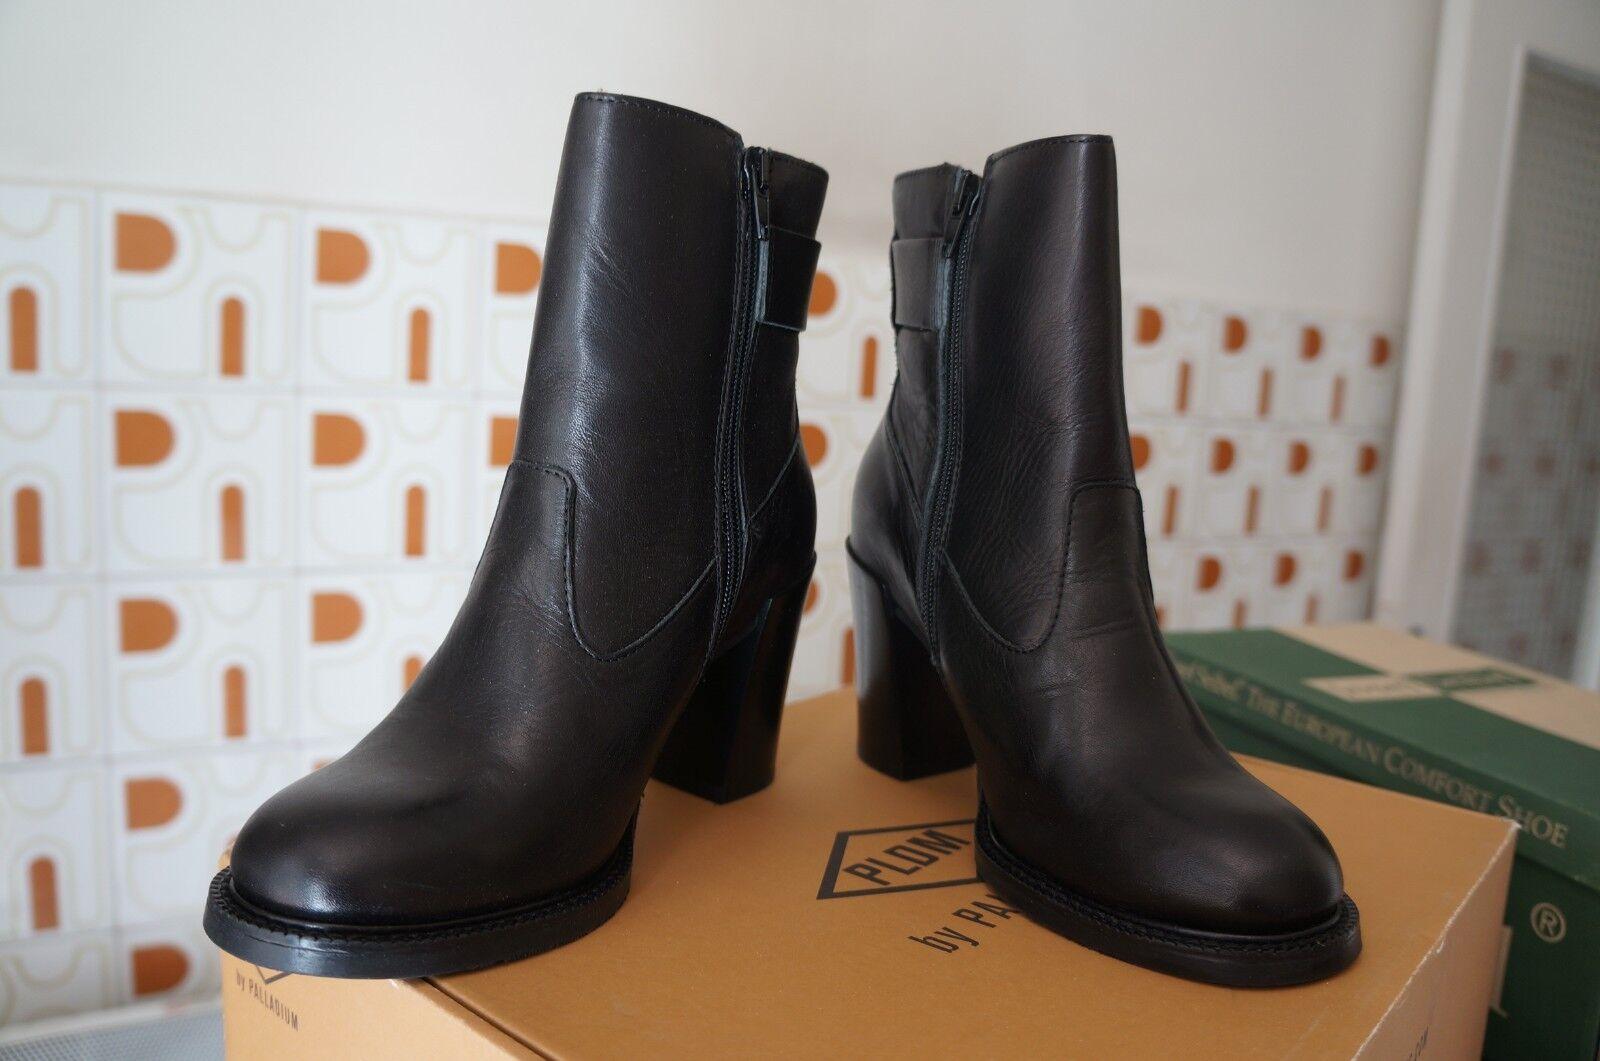 Black36 Palladium Eu Pldm By IbxBottes Hill Classiques FemmesNoir315 5€ POXkZiu